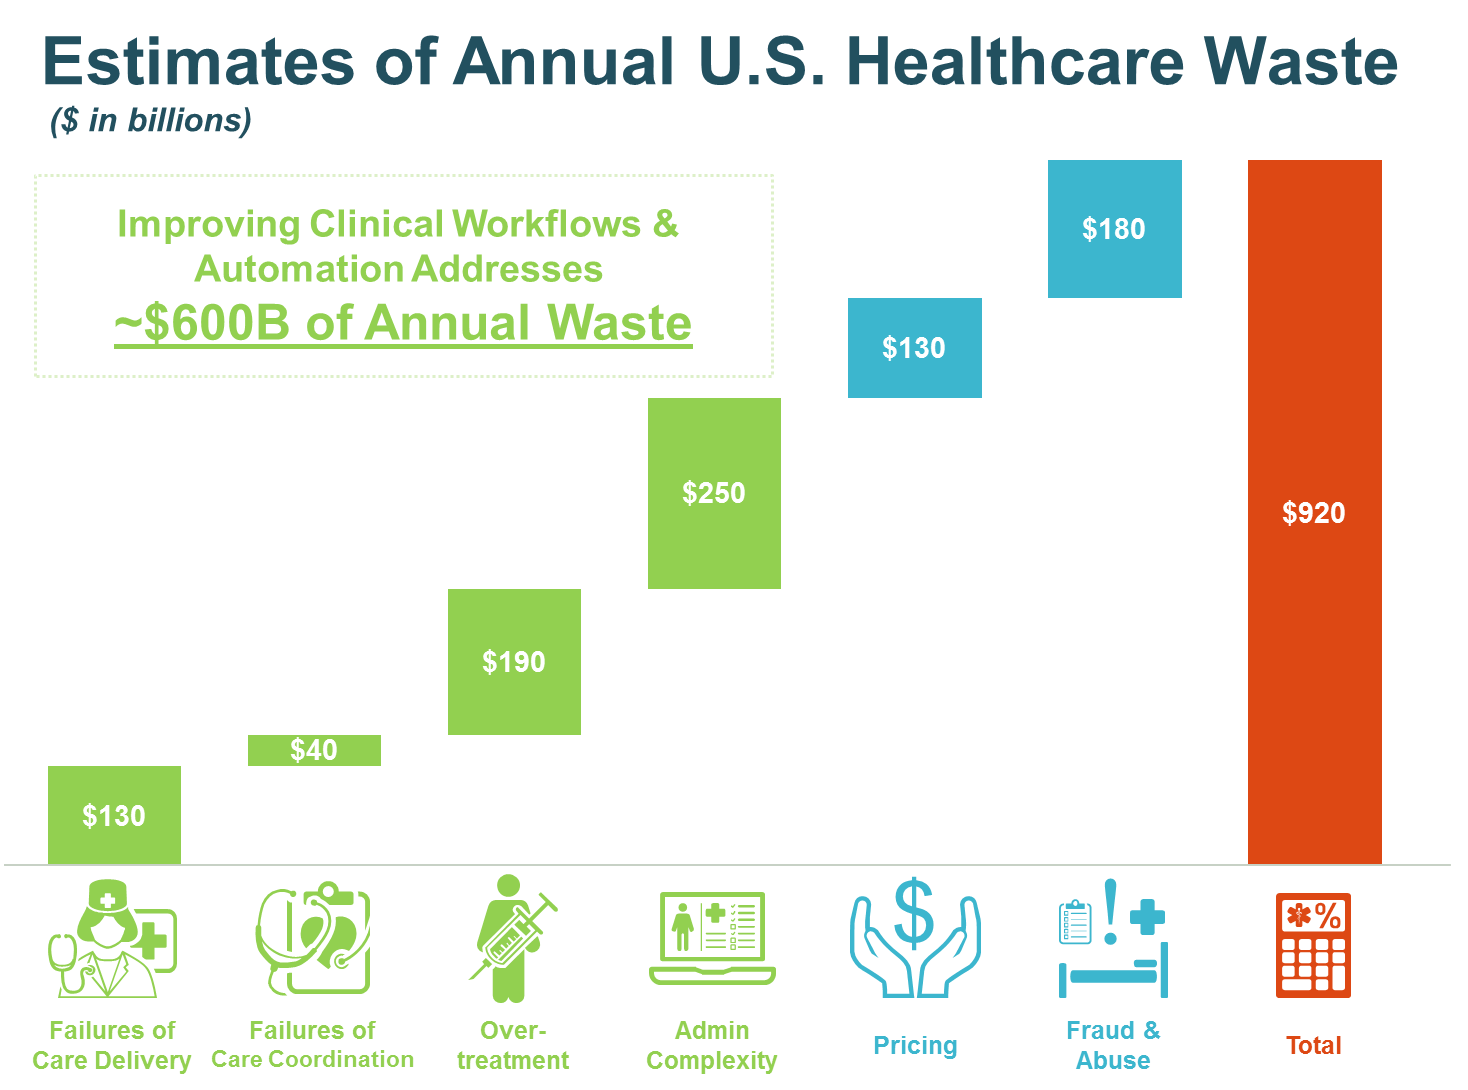 U.S. Healthcare Waste